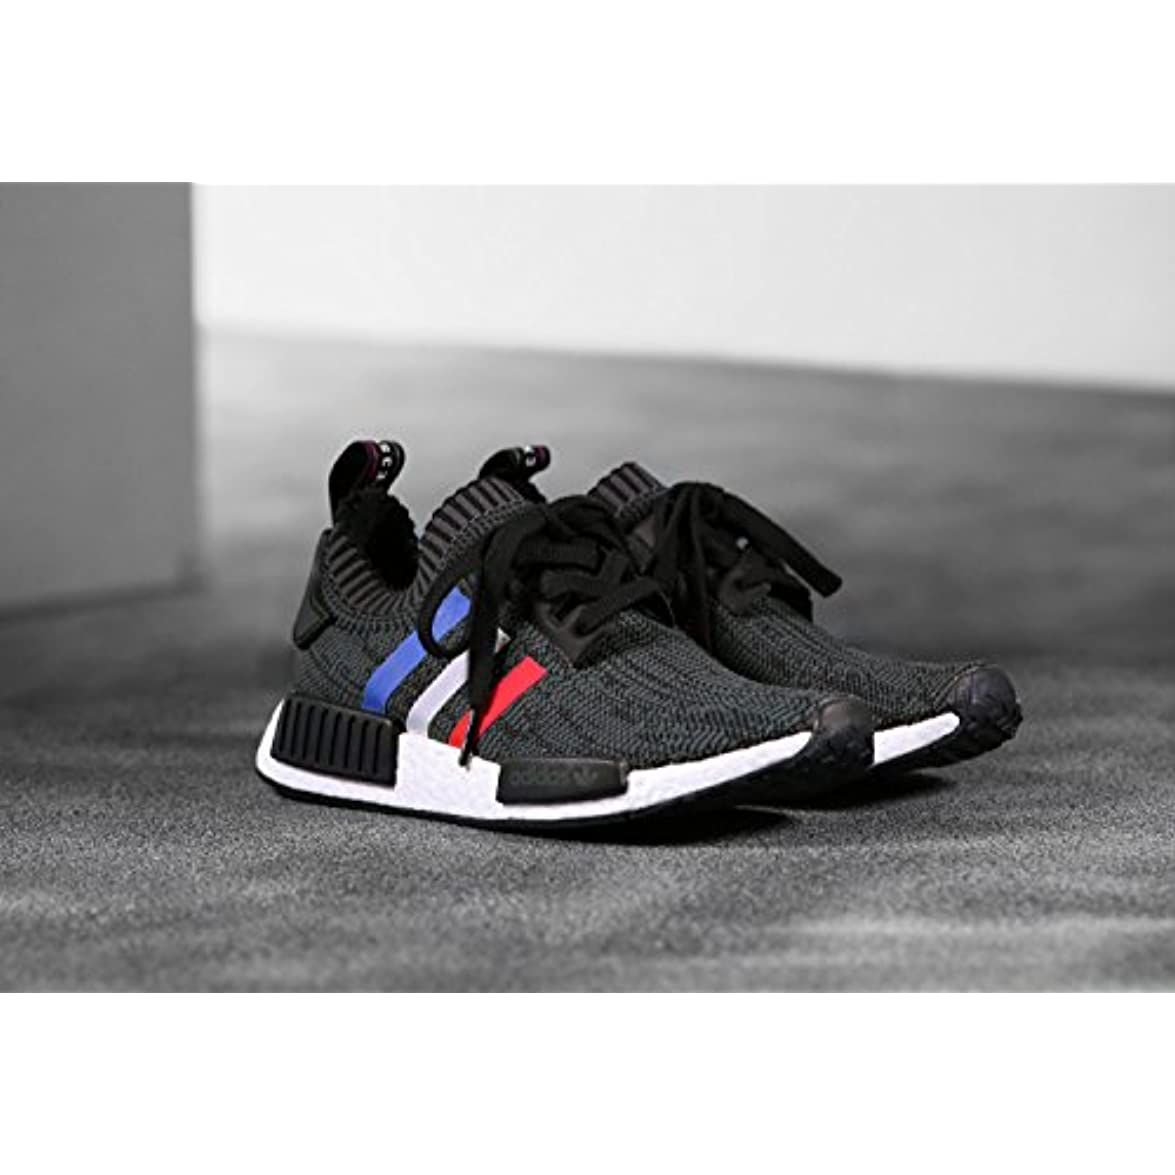 Adidas Originals Nmd R1 Pk Core Black-core Red-ftwr White 6